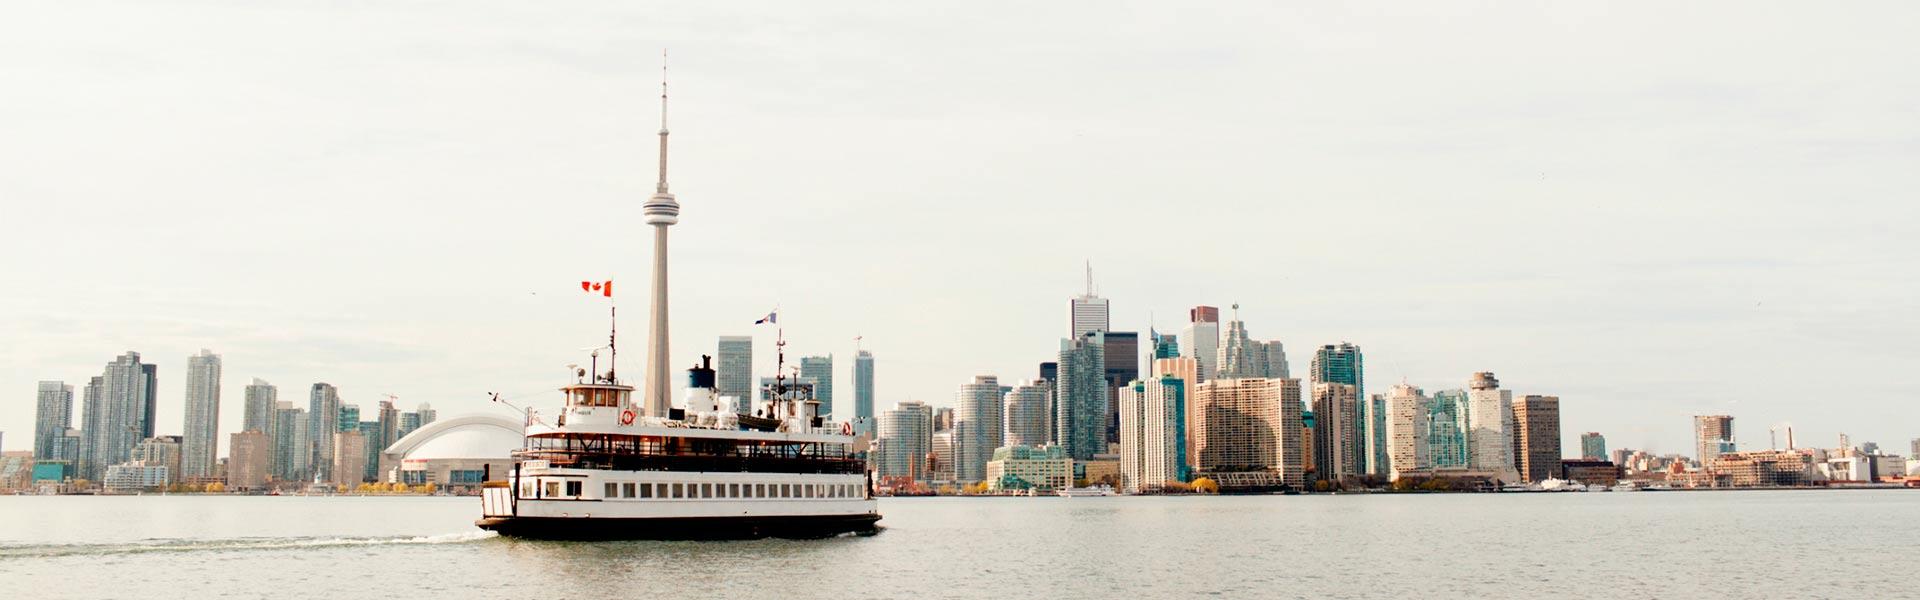 Cursos de inglés en Toronto Canadá